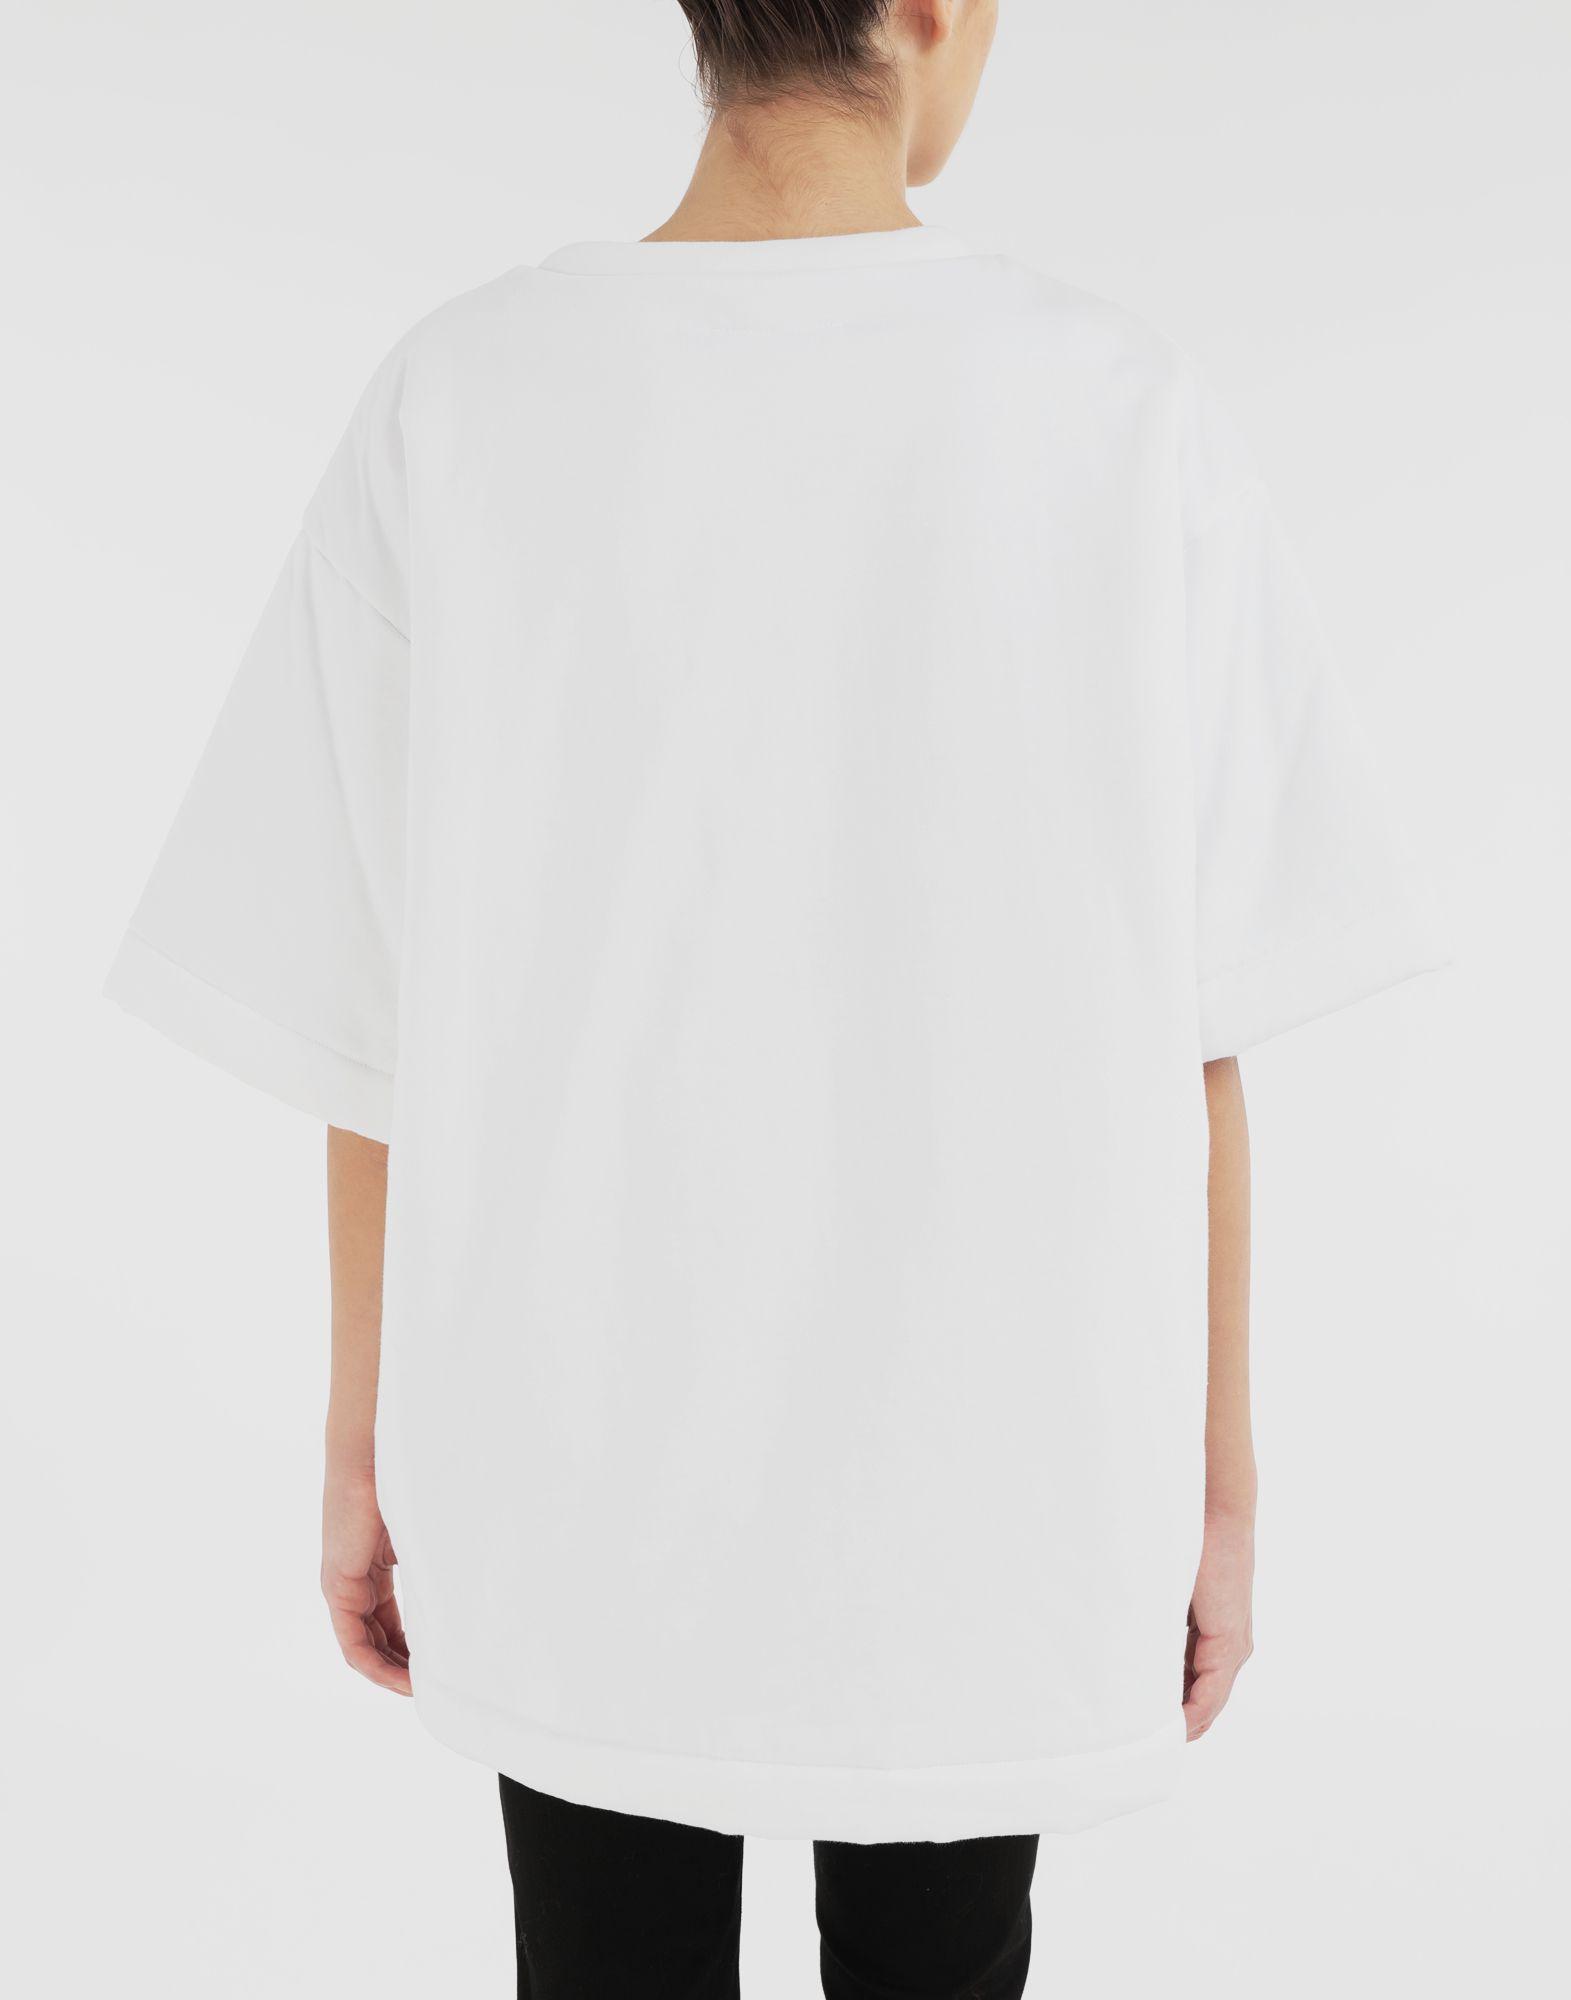 MM6 MAISON MARGIELA T-shirt reversibile con logo T-shirt maniche corte Donna e